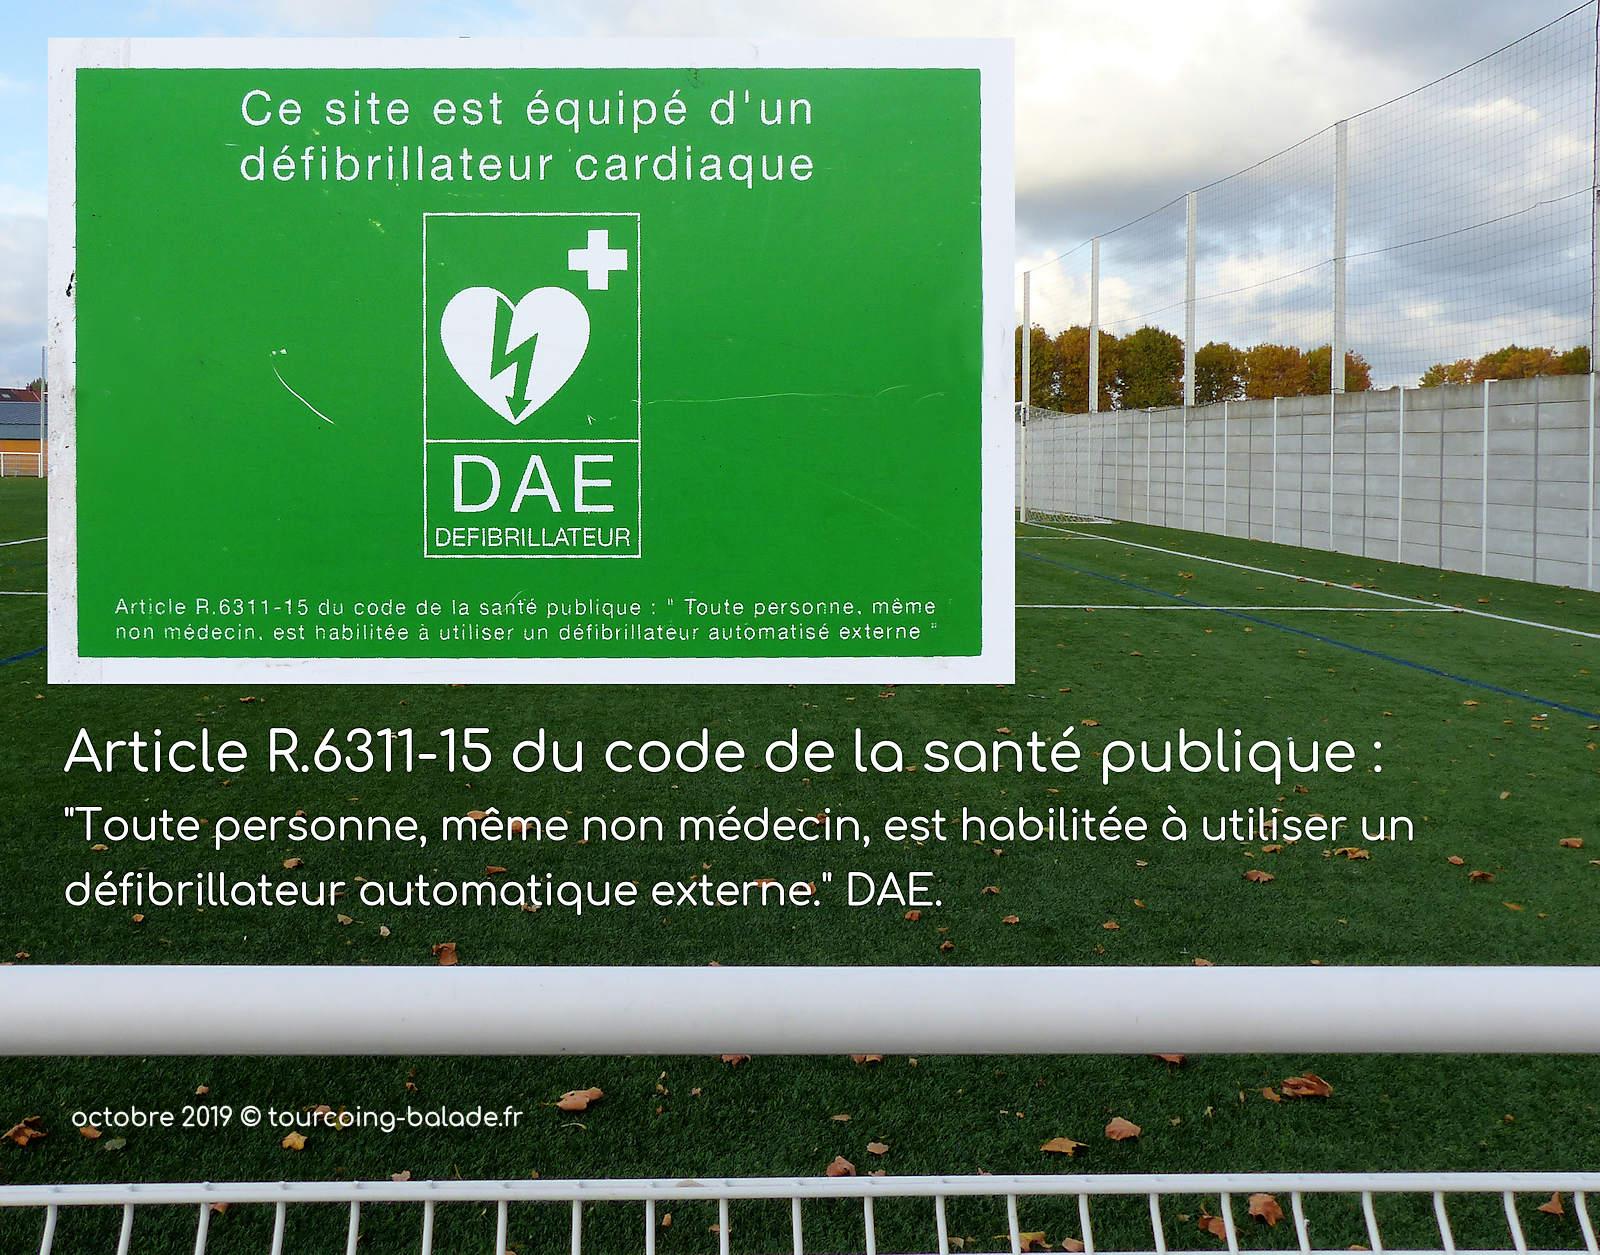 Stade de Foot Houpline, Tourcoing - DAE